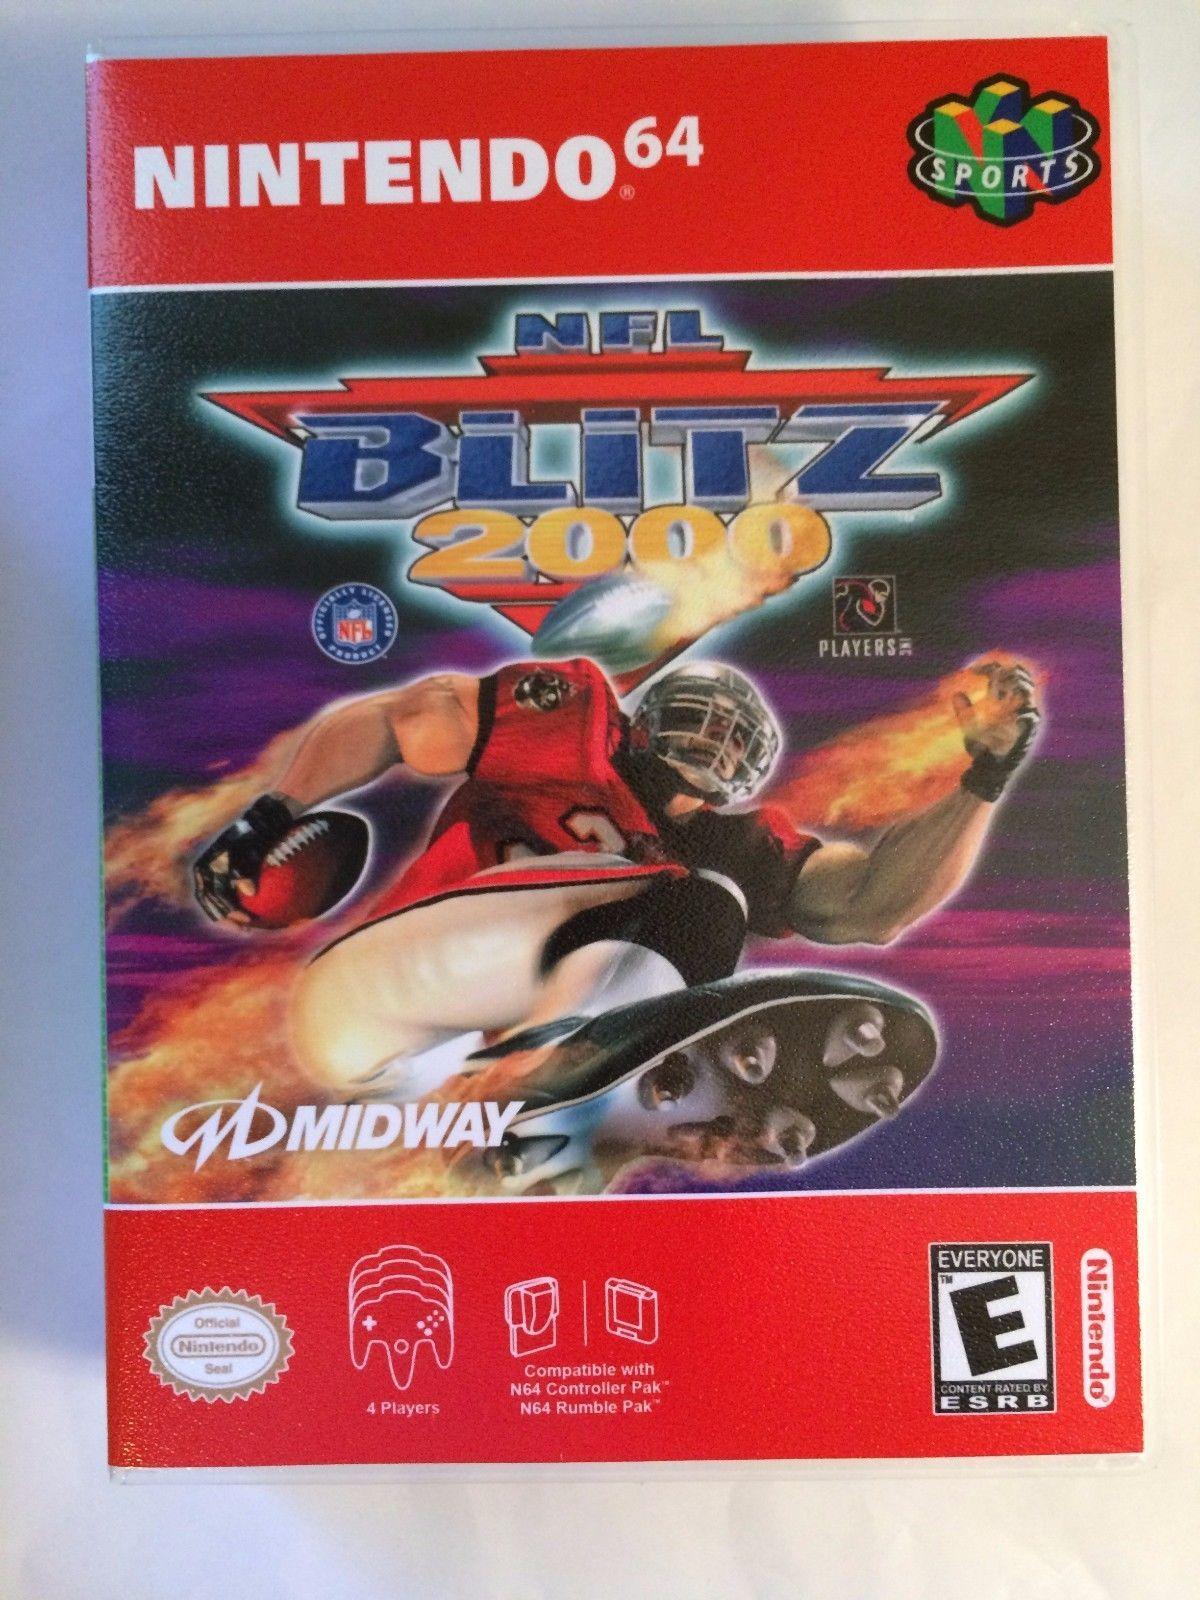 NFL Blitz 2000 - Nintendo 64 - Replacement Case - No Game